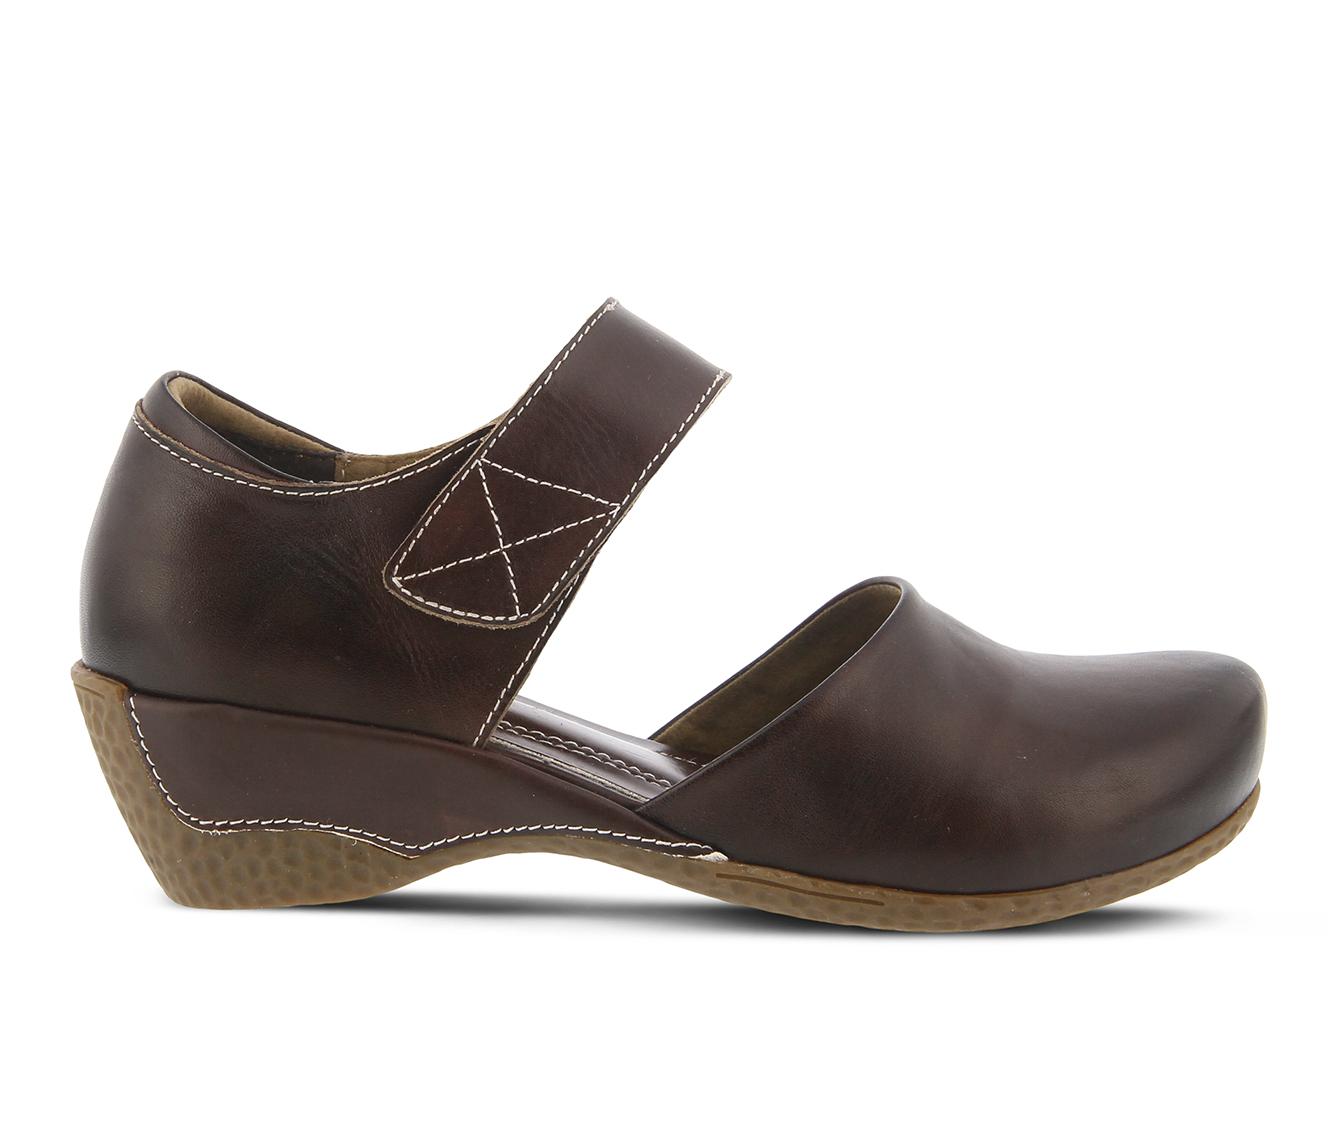 L'Artiste Gloss Women's Shoe (Brown Leather)